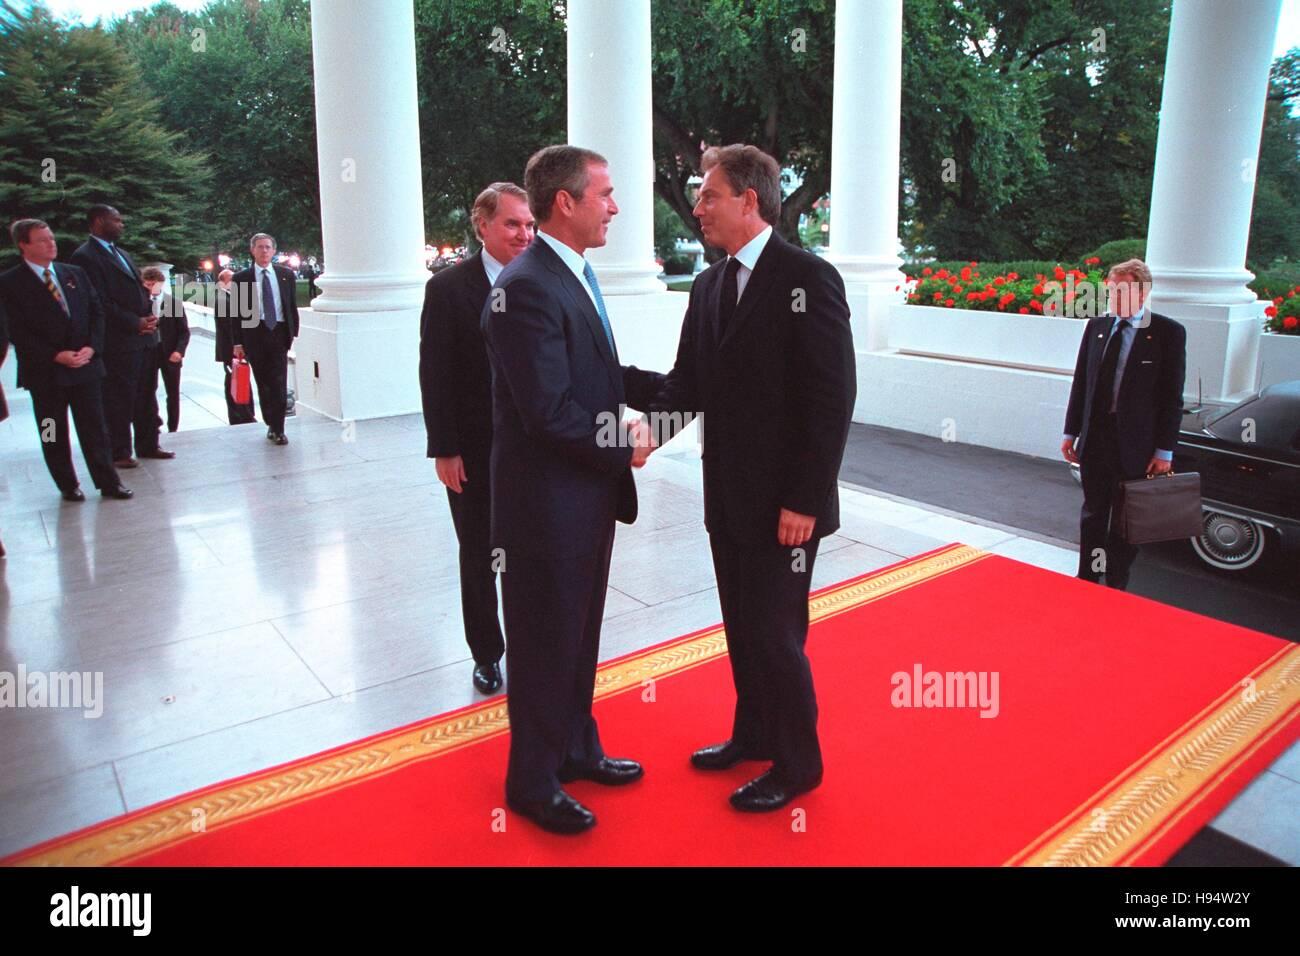 U.S. President George W. Bush greets British Prime Minister Tony Blair at the White House North Portico entrance - Stock Image